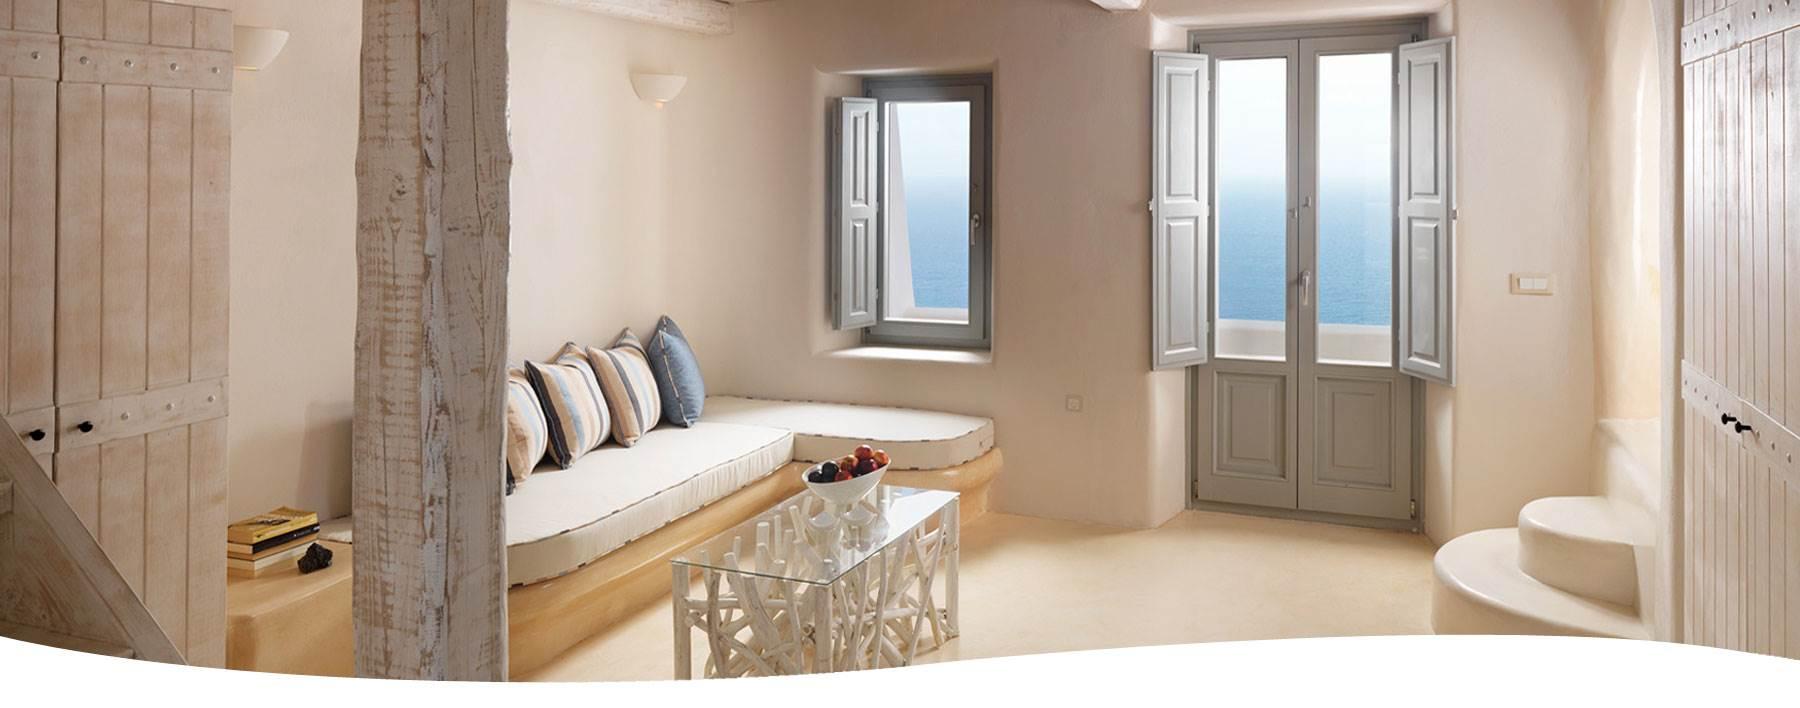 Cruise III Suite